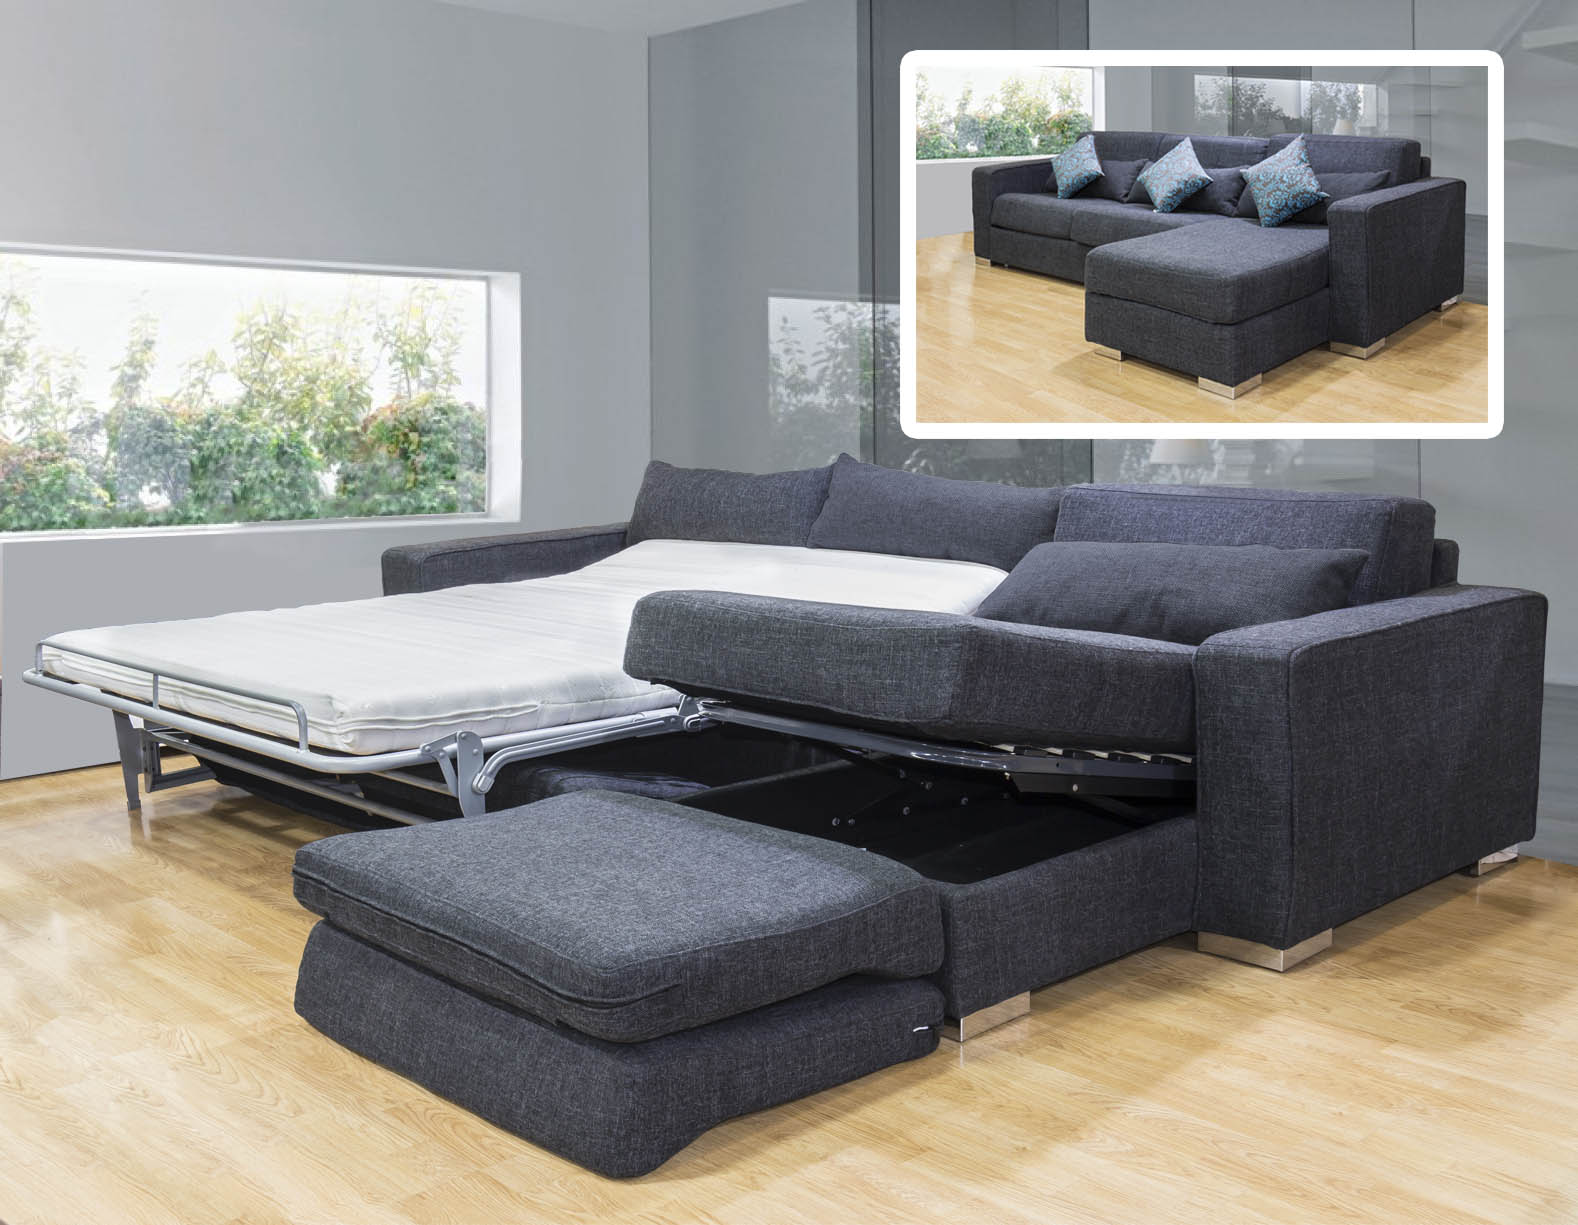 Muebles sofa cama lima 20170830094545 for Muebles de sala promart